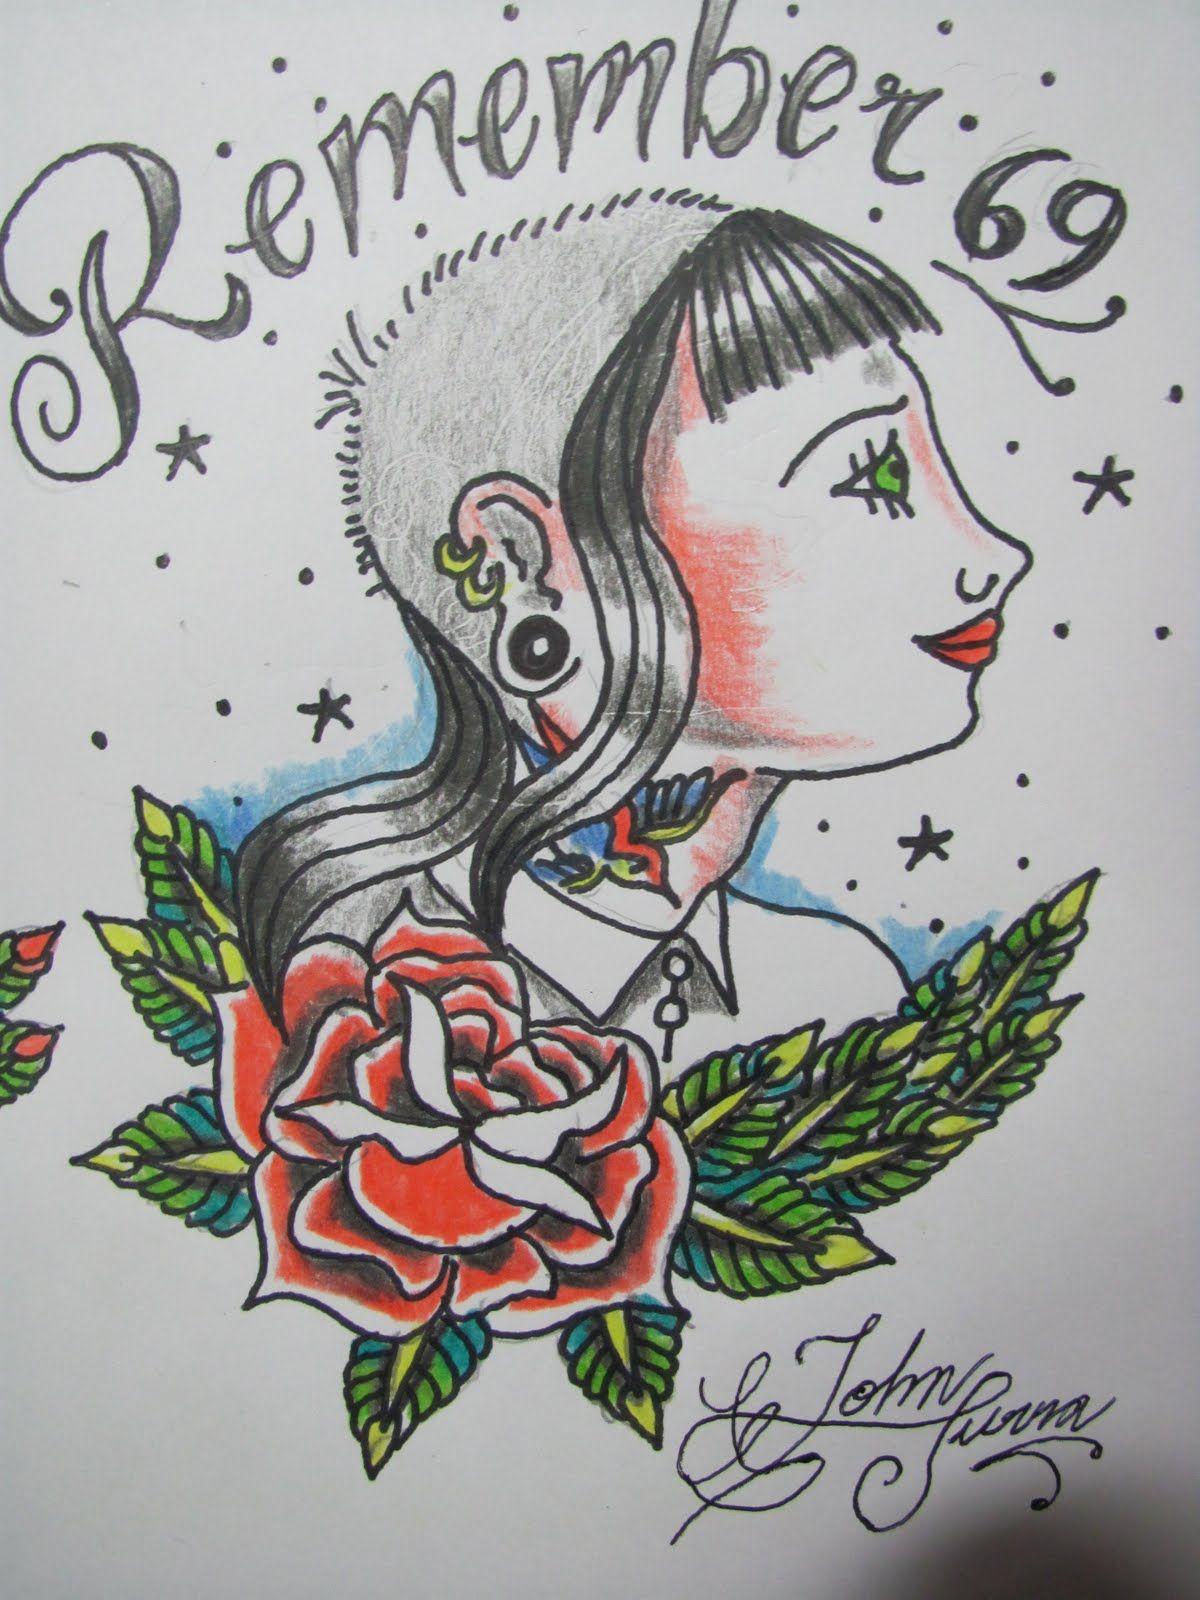 Skinhead Tattoos   Traditional Skinhead Tattoo Art